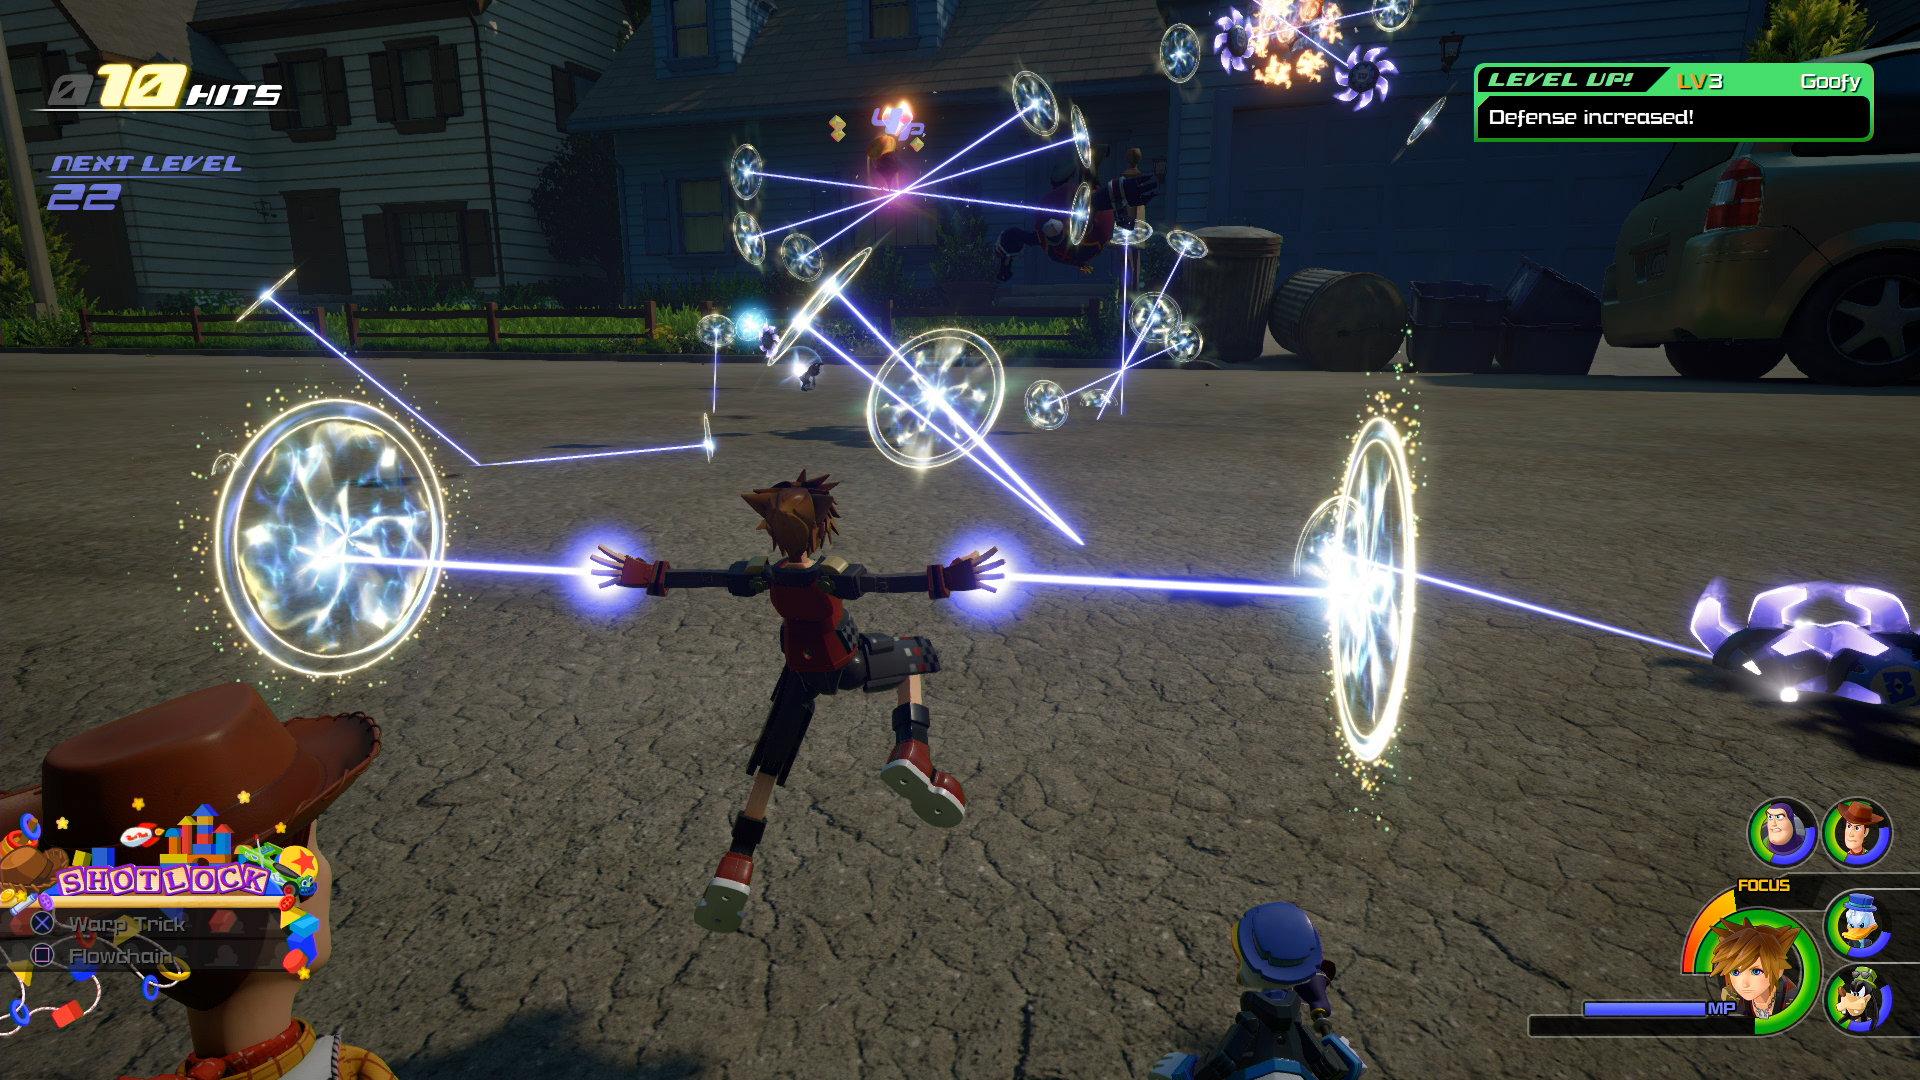 Game Cheats Kingdom Hearts Iii Megagames